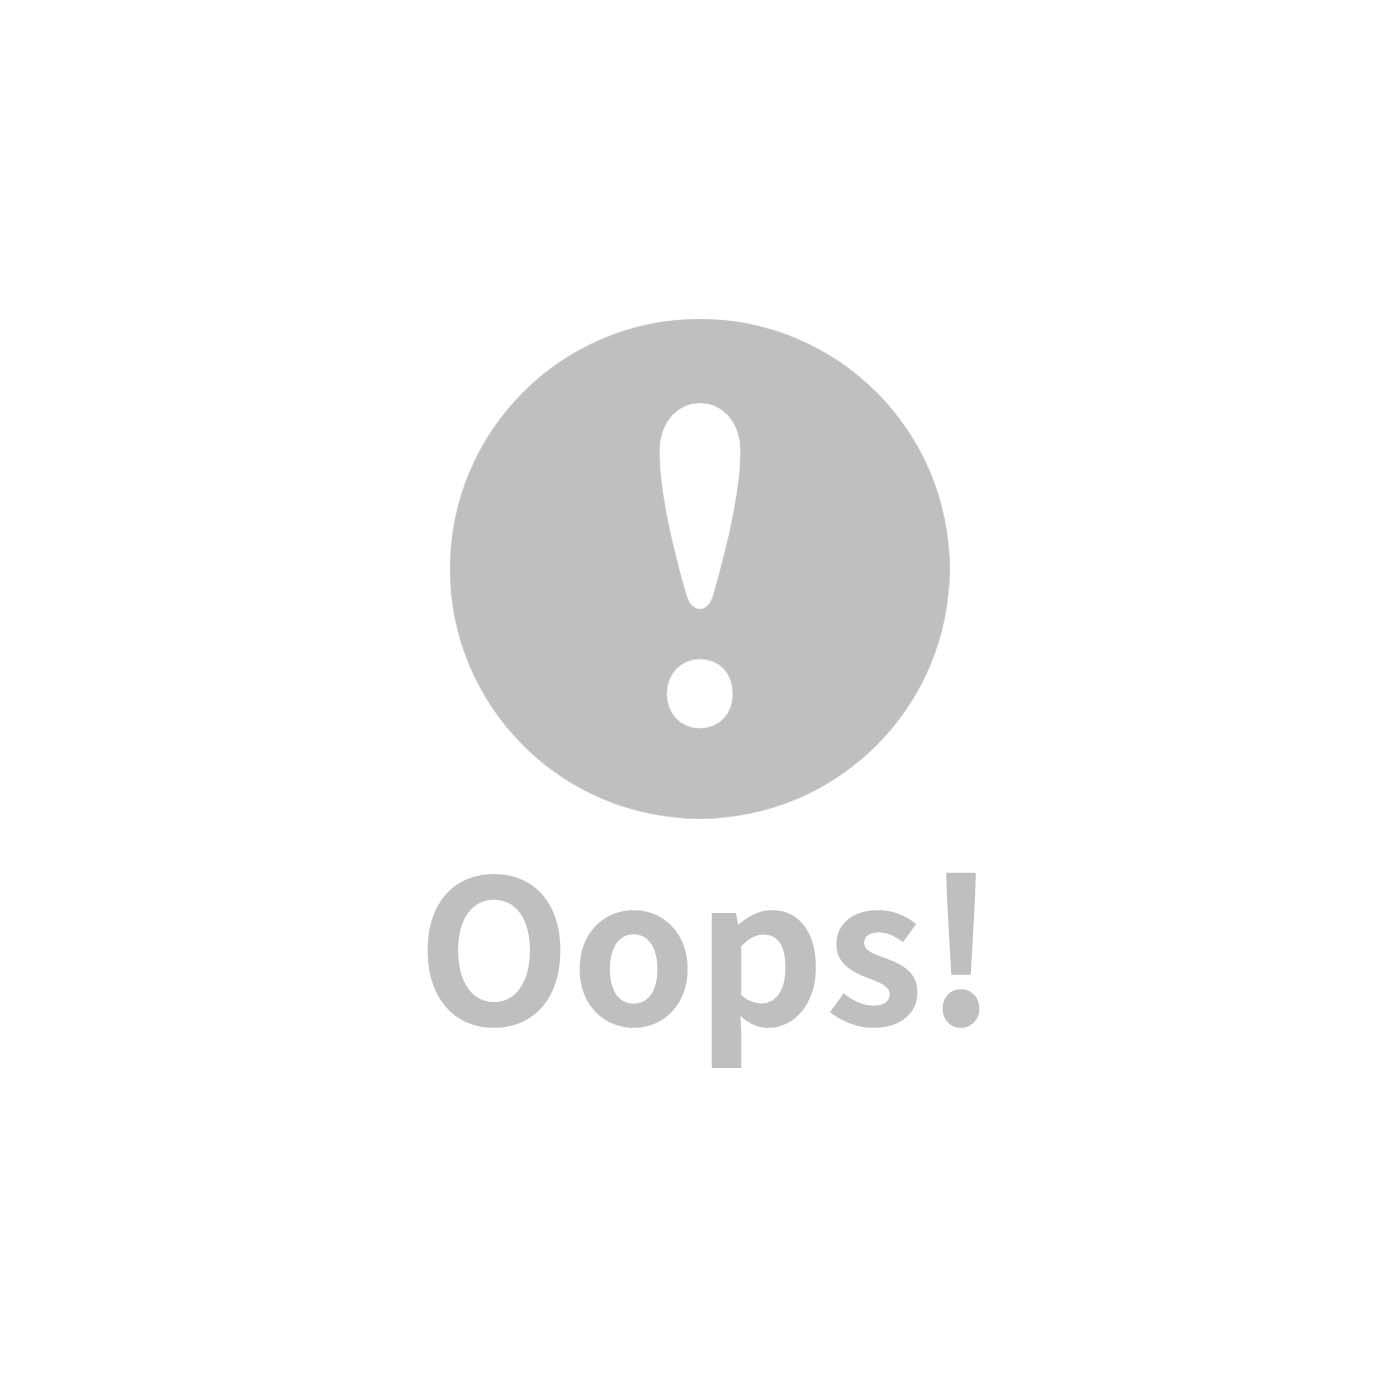 global affairs 童話手工編織安撫玩偶(36cm)-小紅帽